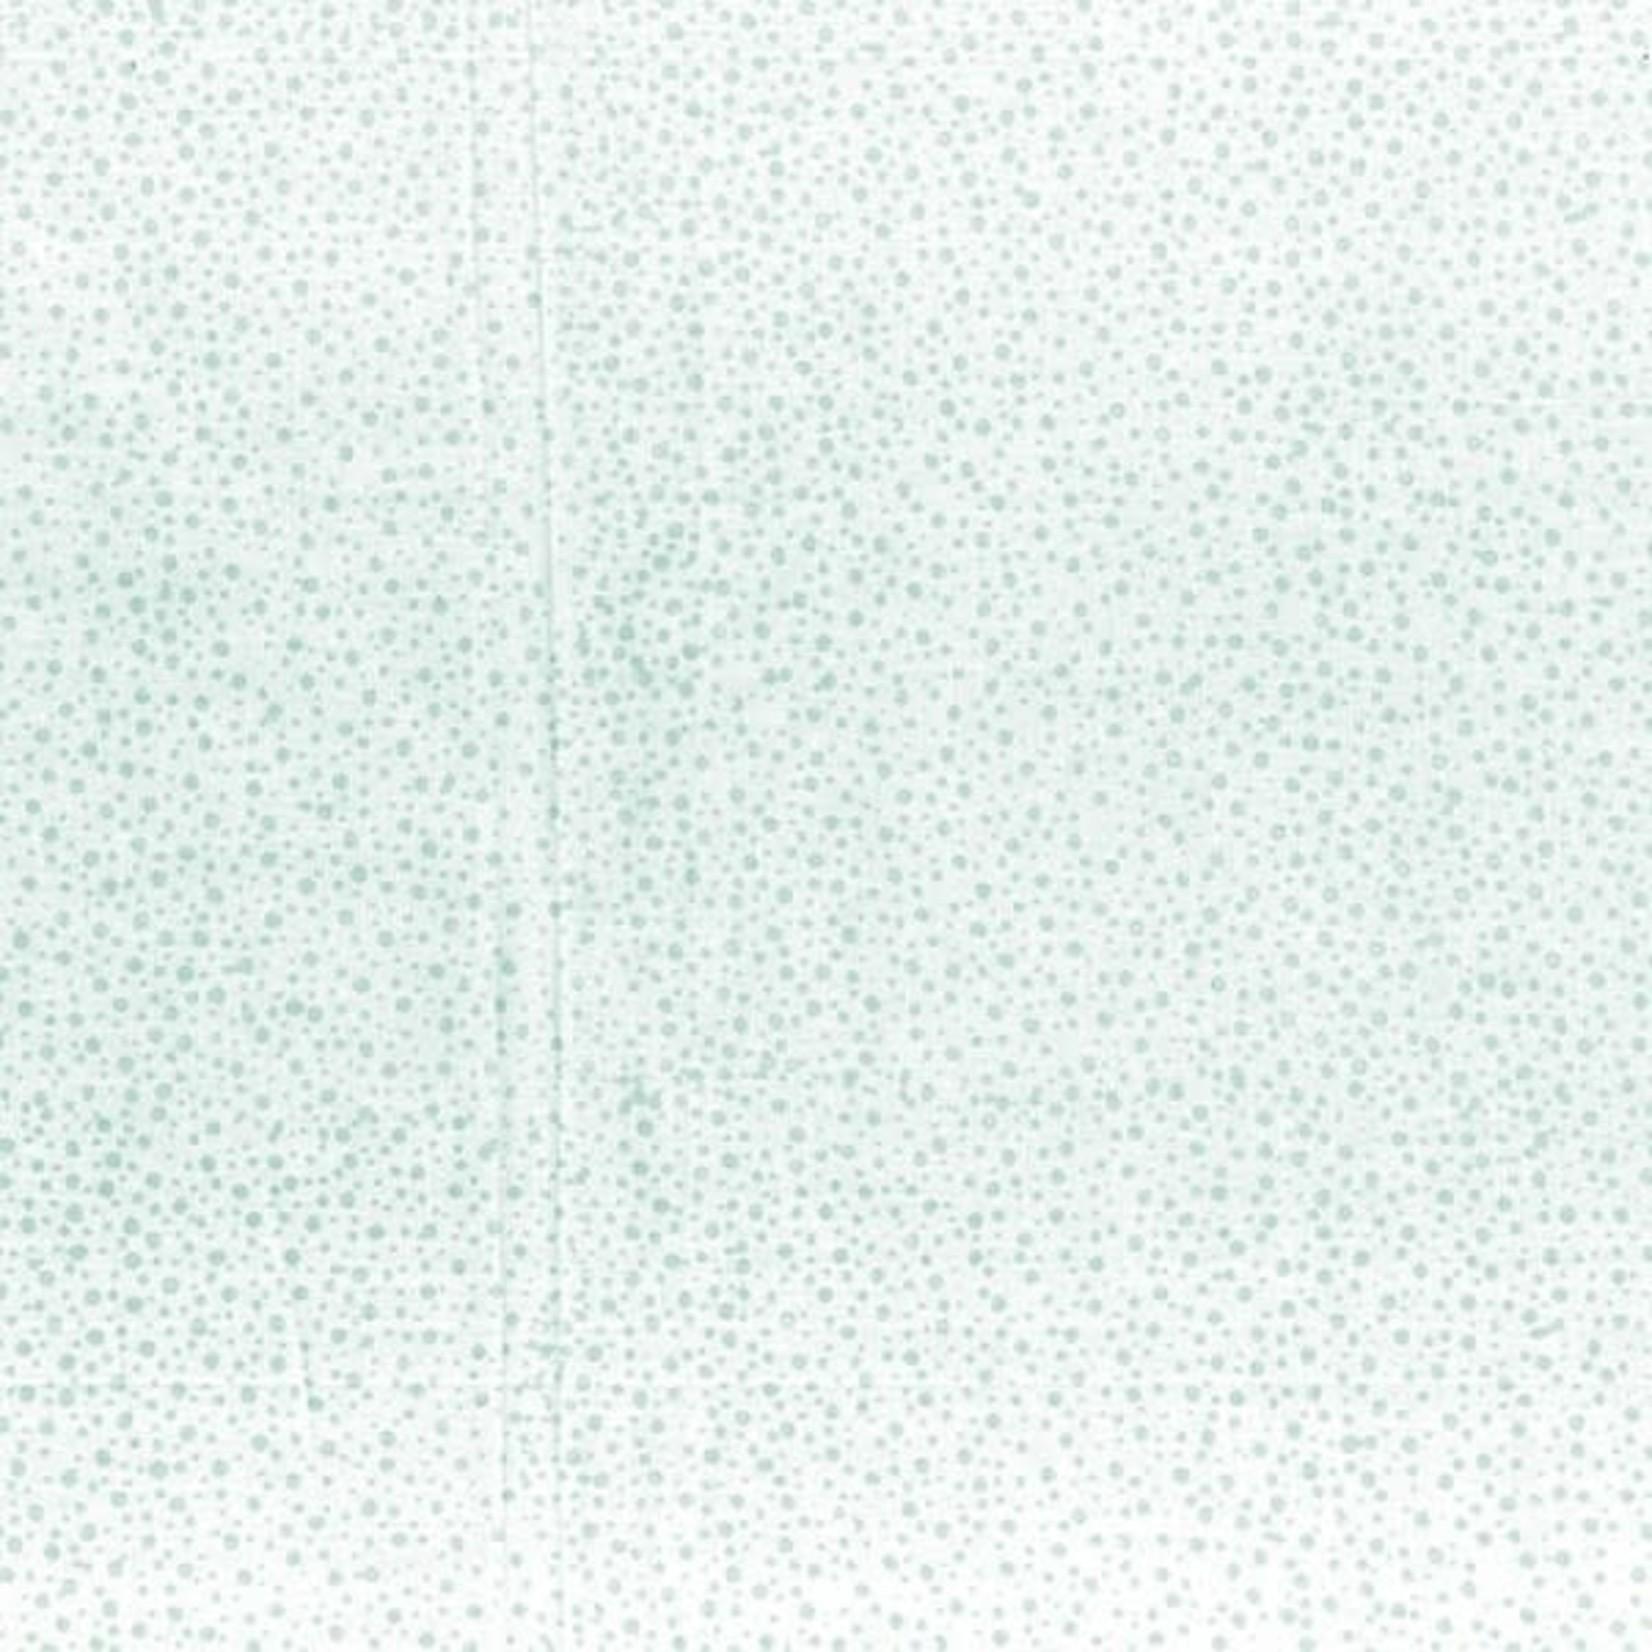 Hoffman Fabrics Dot 885 - 22 Ivory